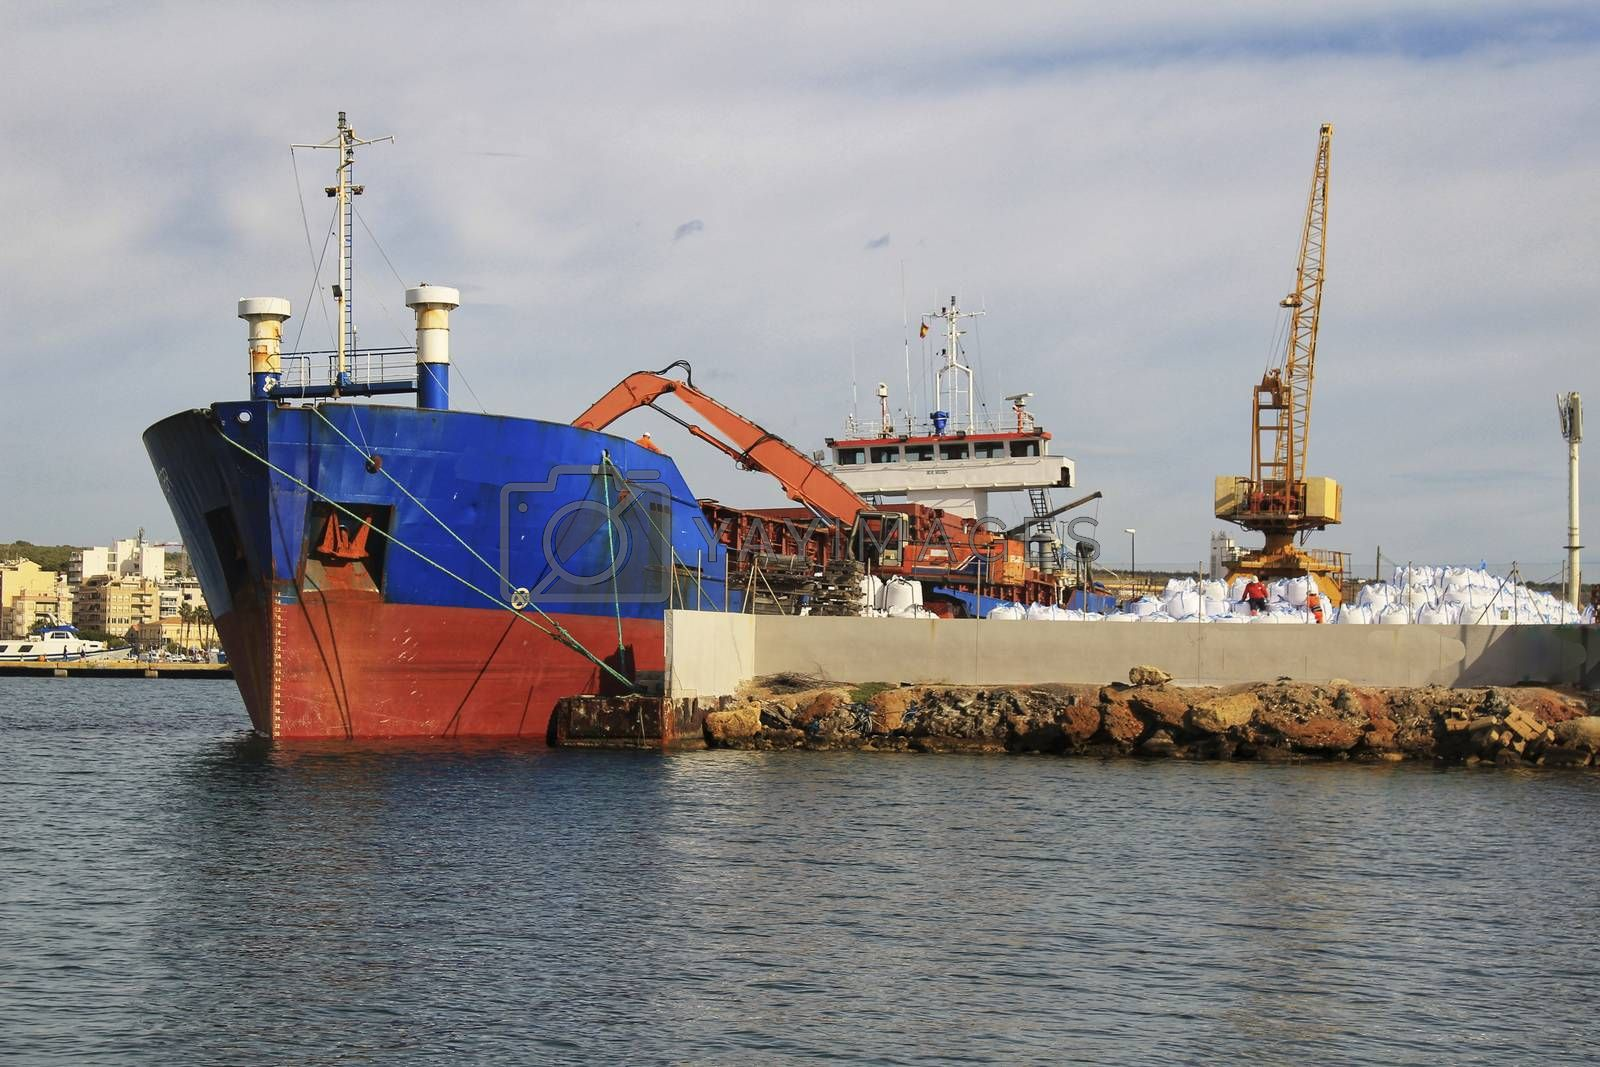 Merchant ship unloading at the dock in Santa Pola